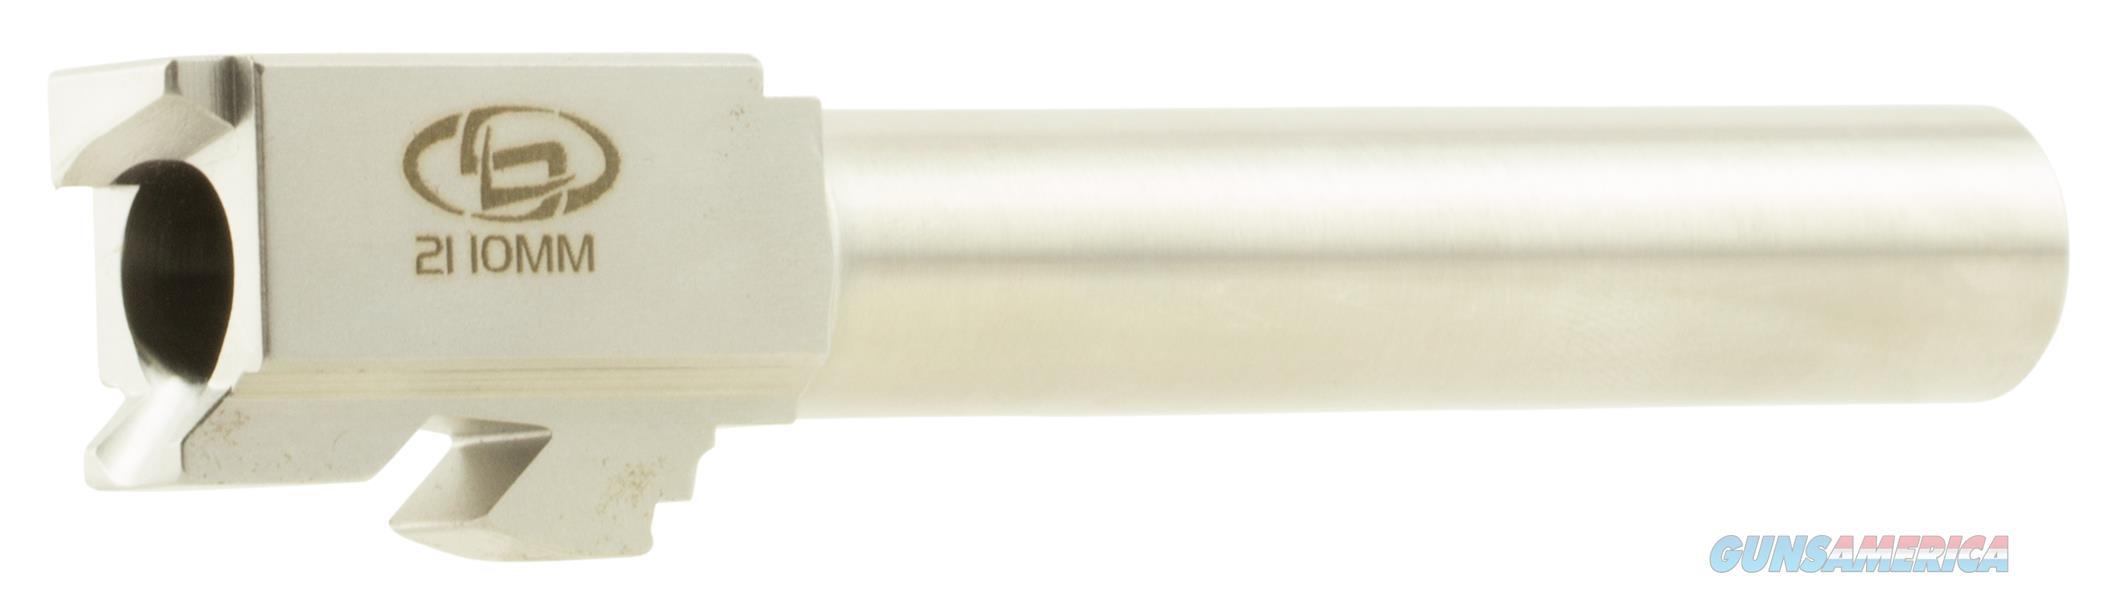 "Stormlake 34017 Glock 21/21Sf 10Mm Conversion For 45 Acp 4.6"" Stainless 34017  Non-Guns > Barrels"